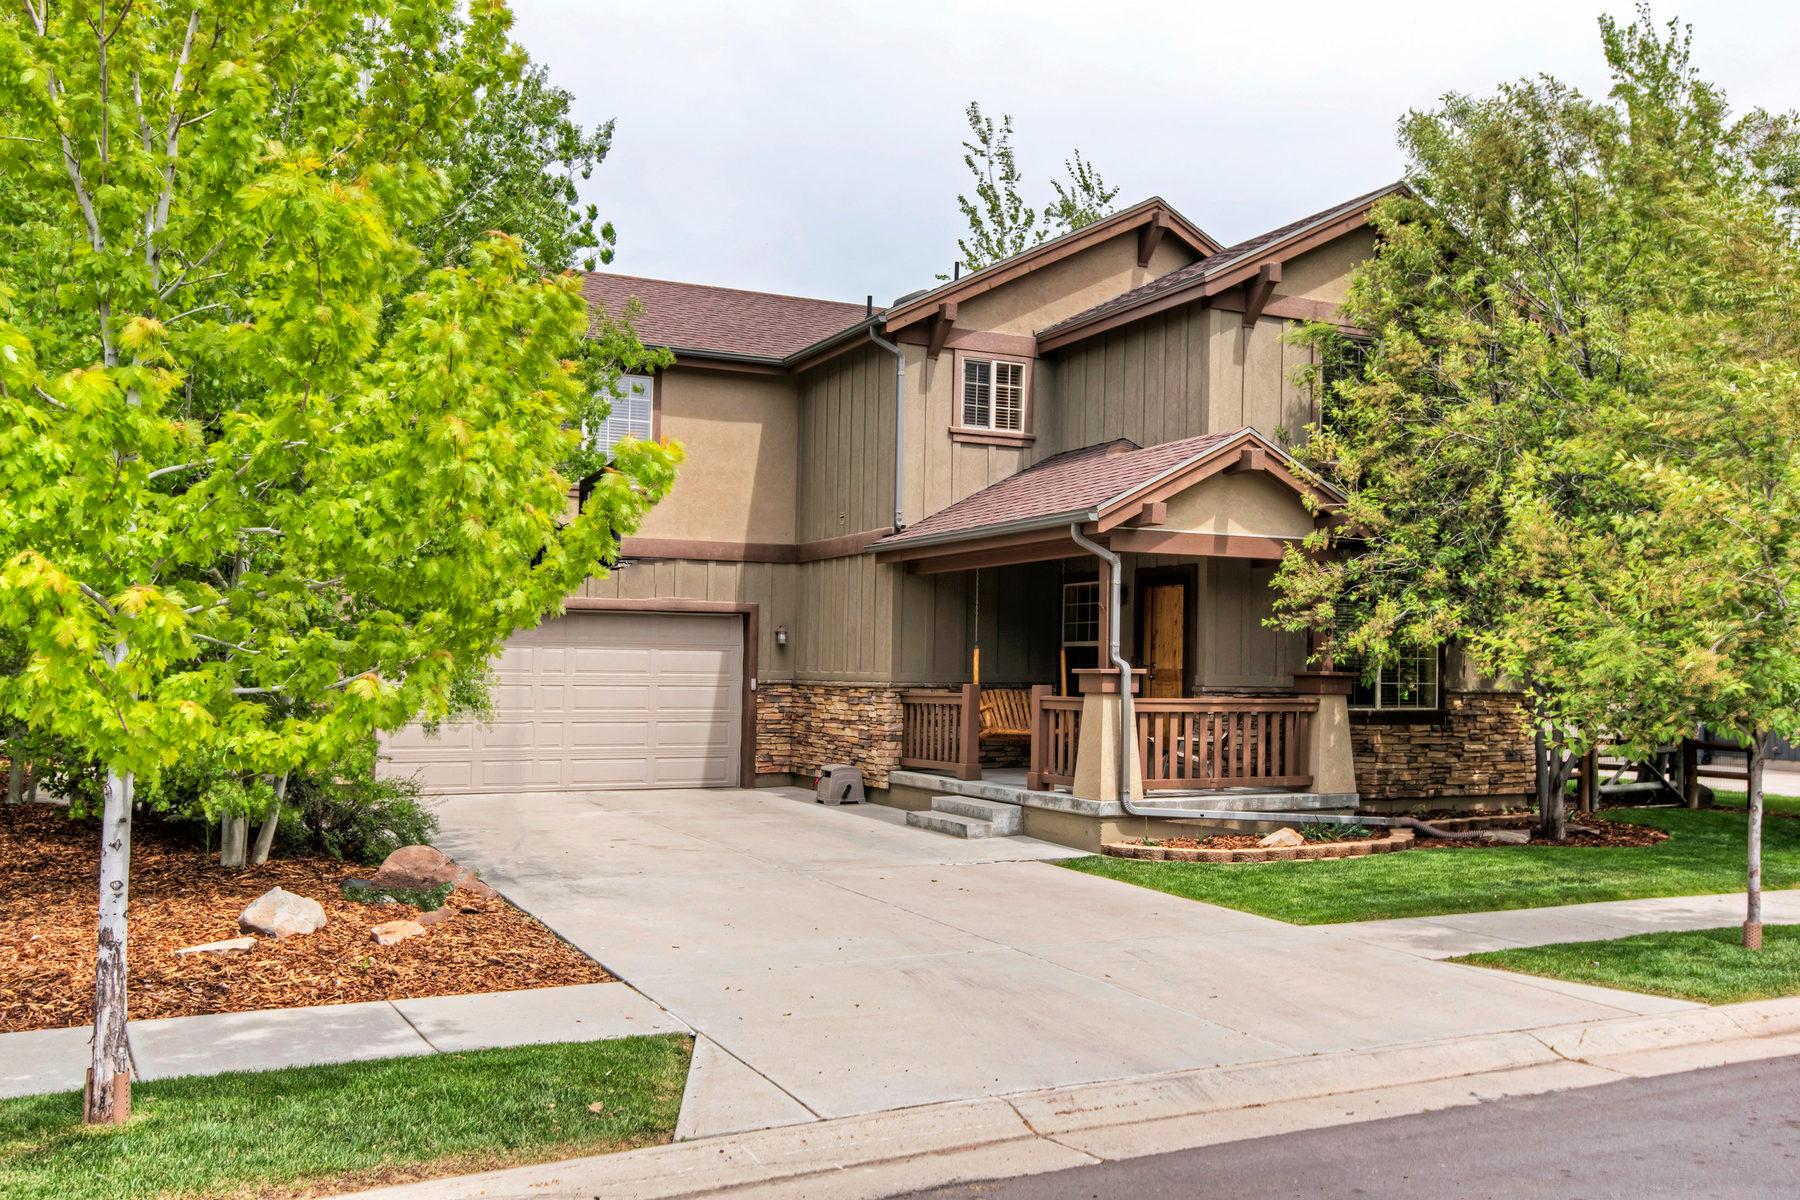 独户住宅 为 销售 在 Amazing Location Charming Style 5661 N Aspenleaf Dr 帕克城, 犹他州, 84098 美国